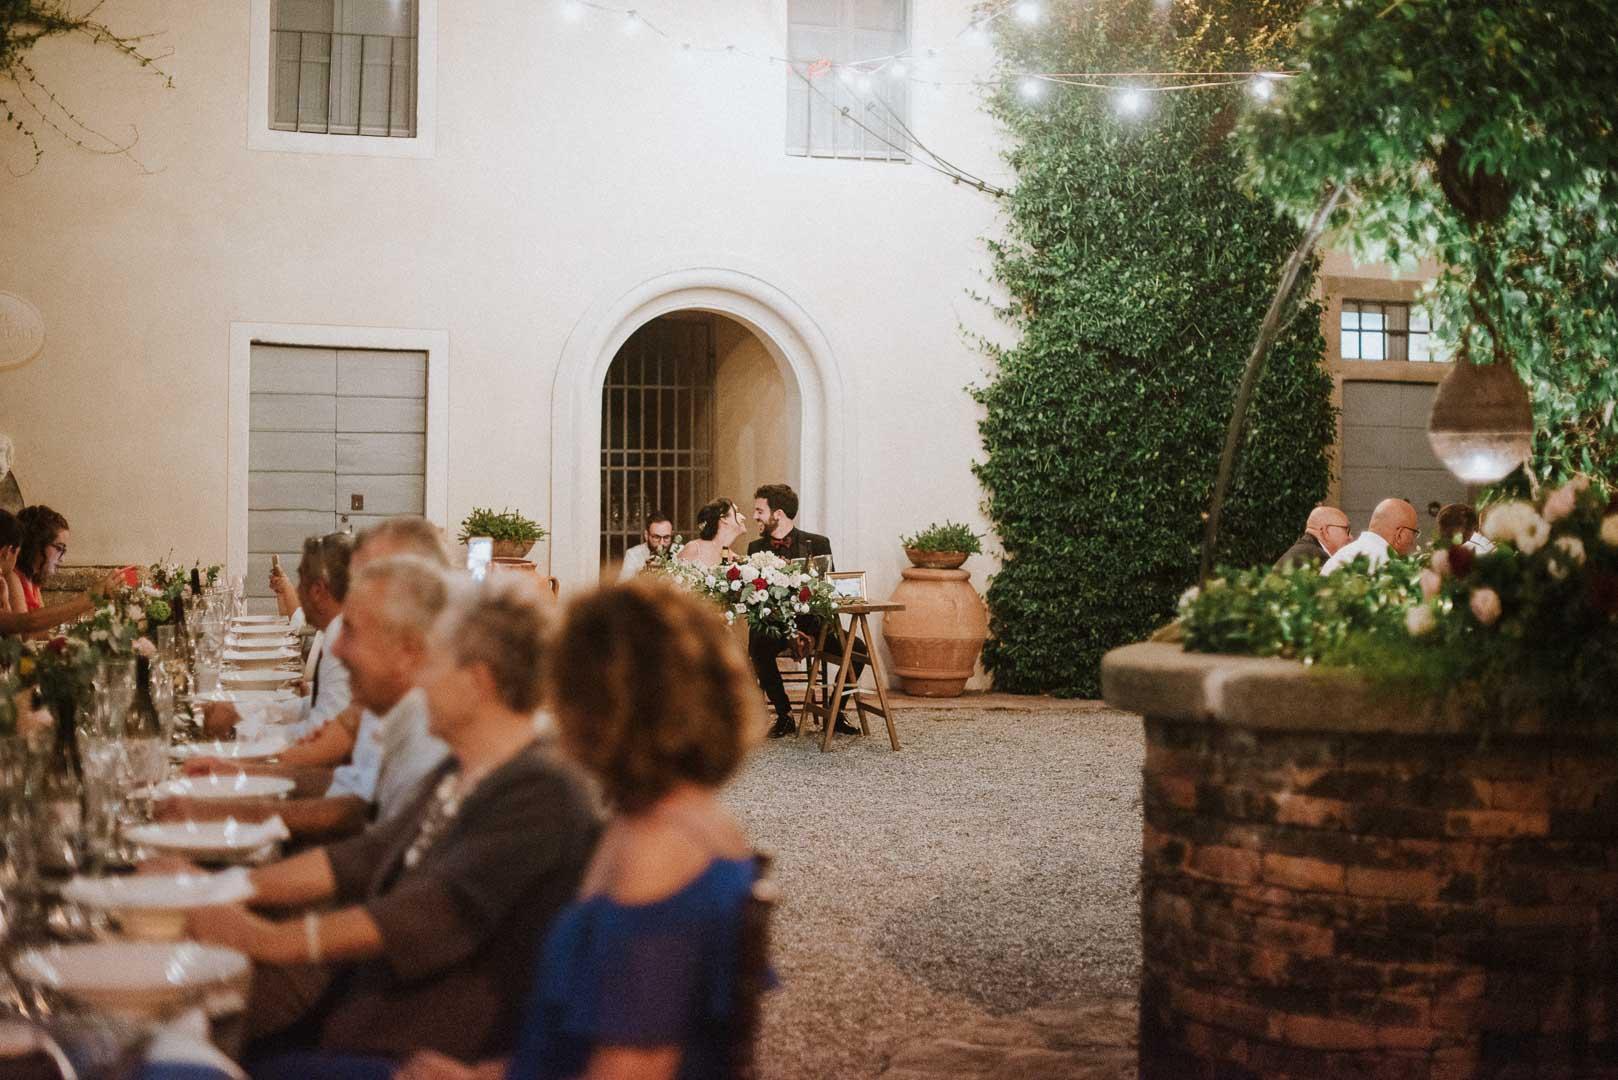 wedding-photographer-destination-fineart-bespoke-reportage-tuscany-villascorzi-vivianeizzo-spazio46-164